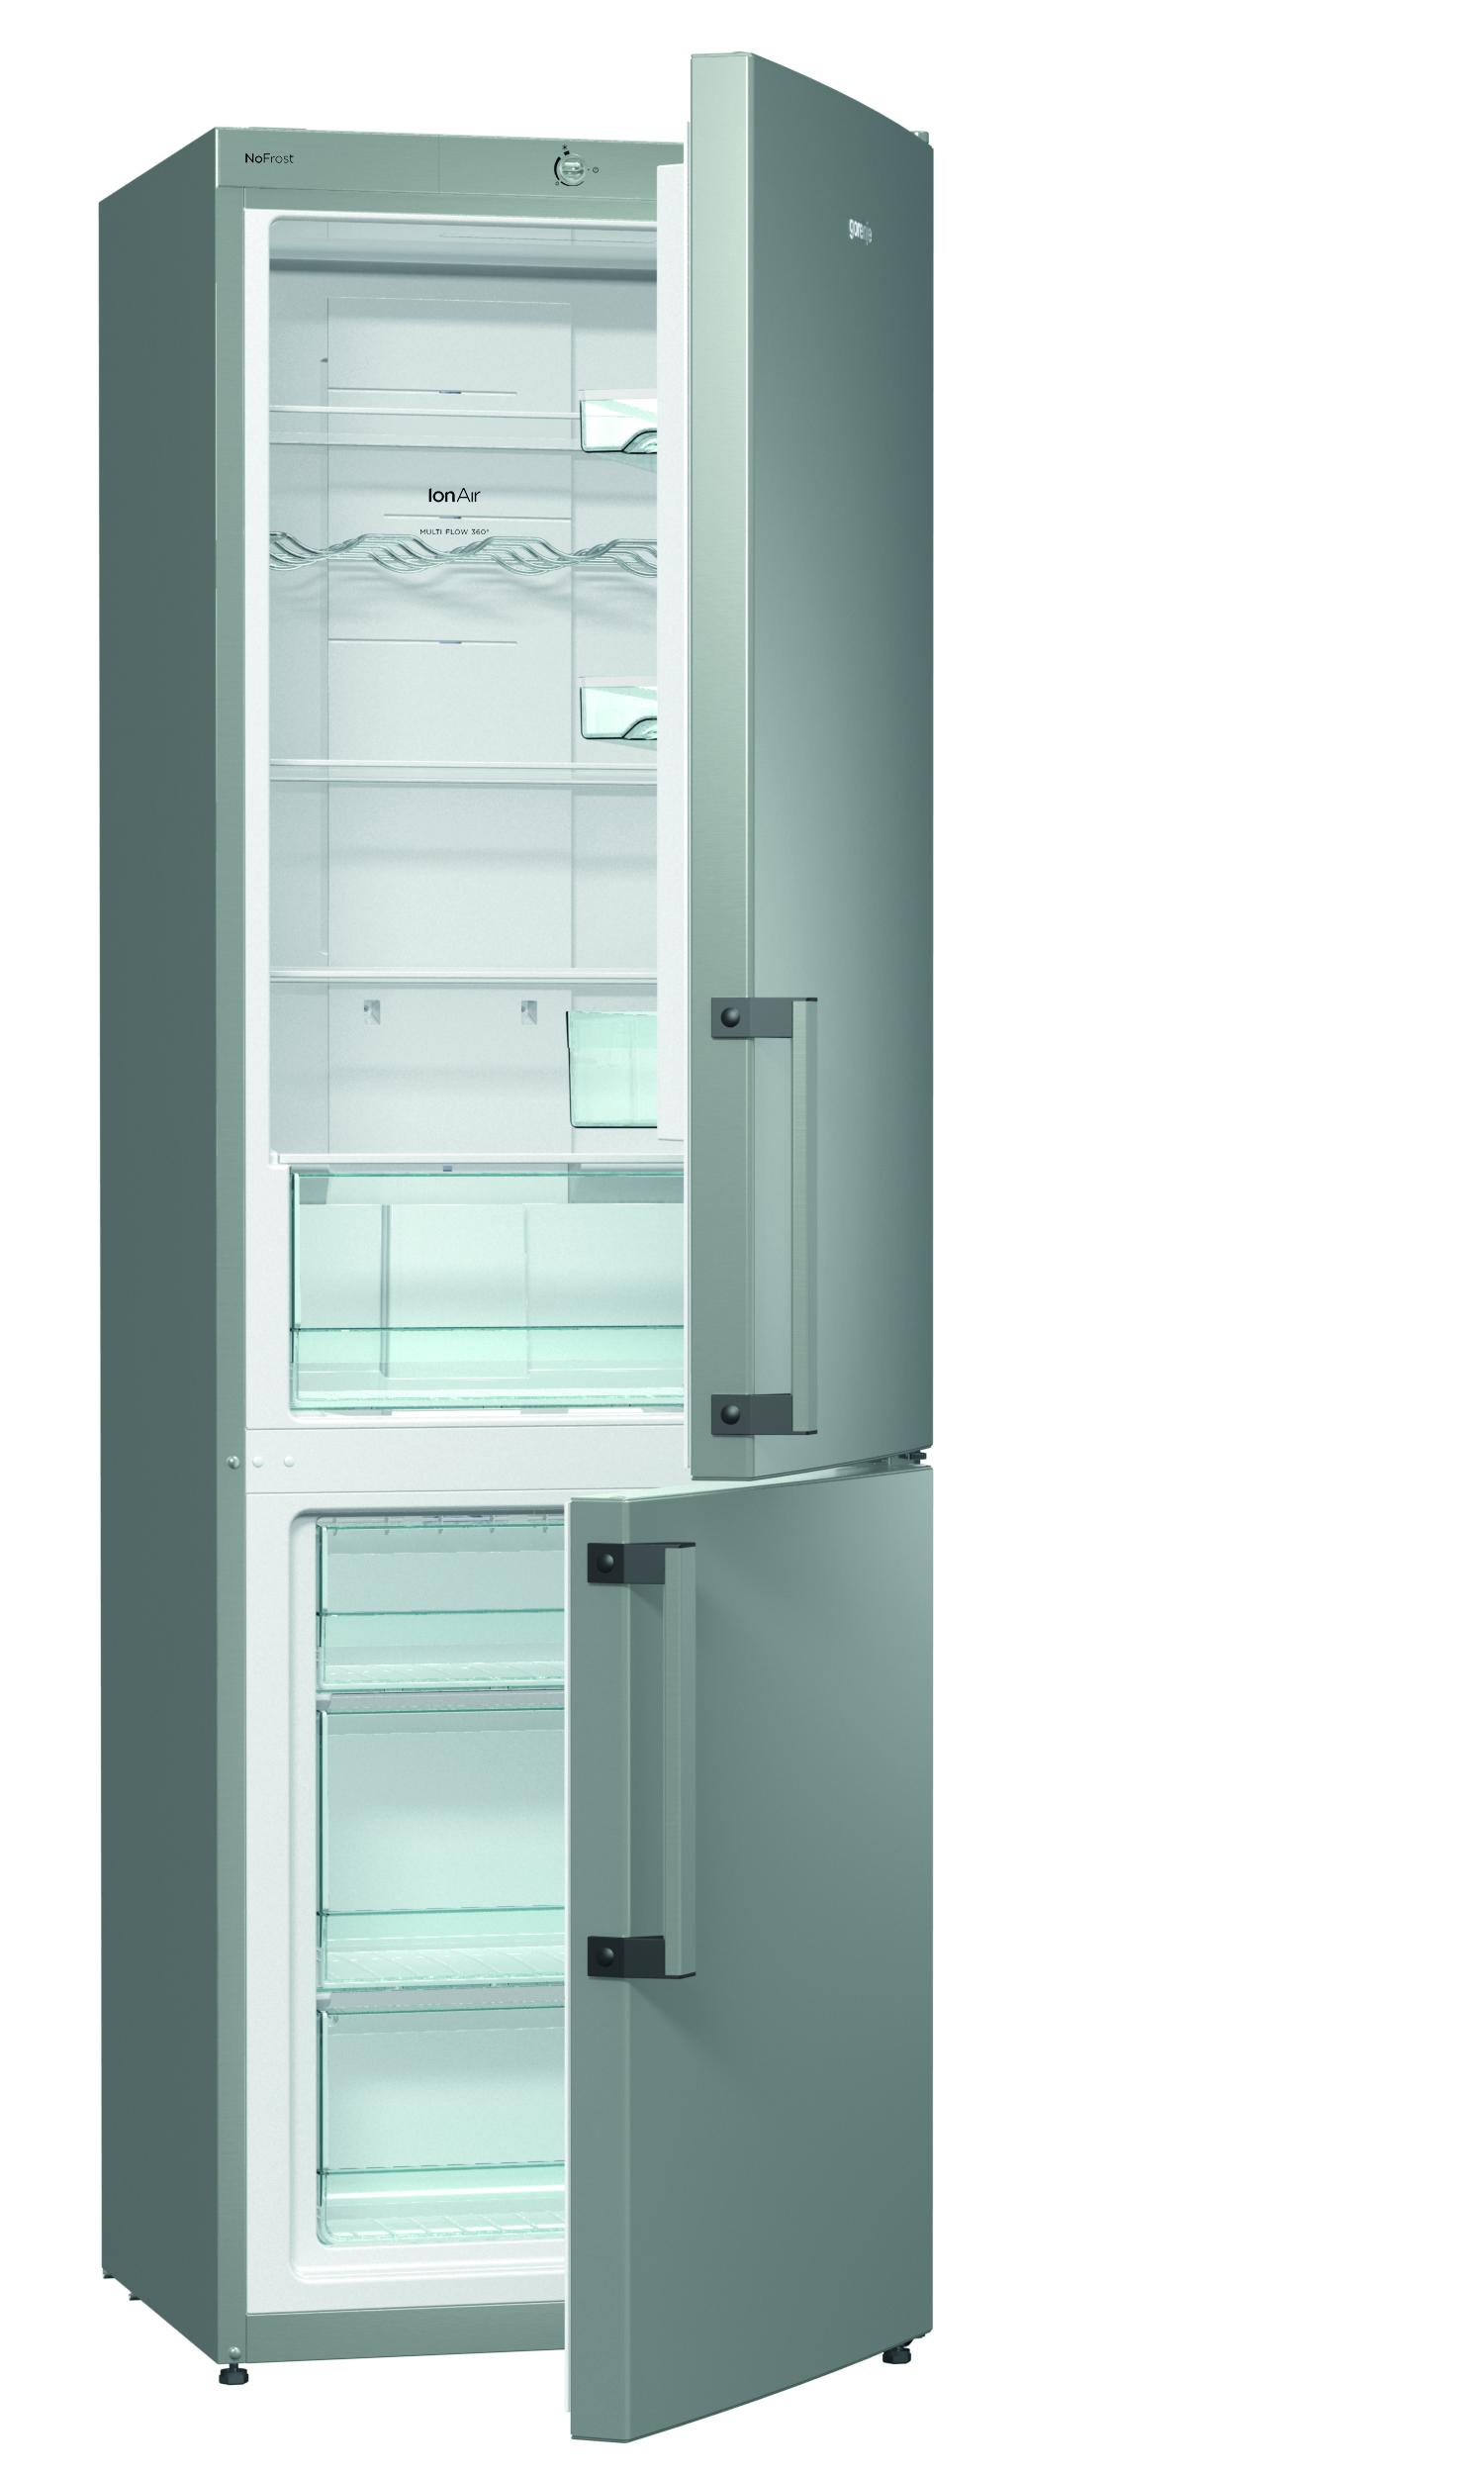 fridge_gorenje_nrk6191cx